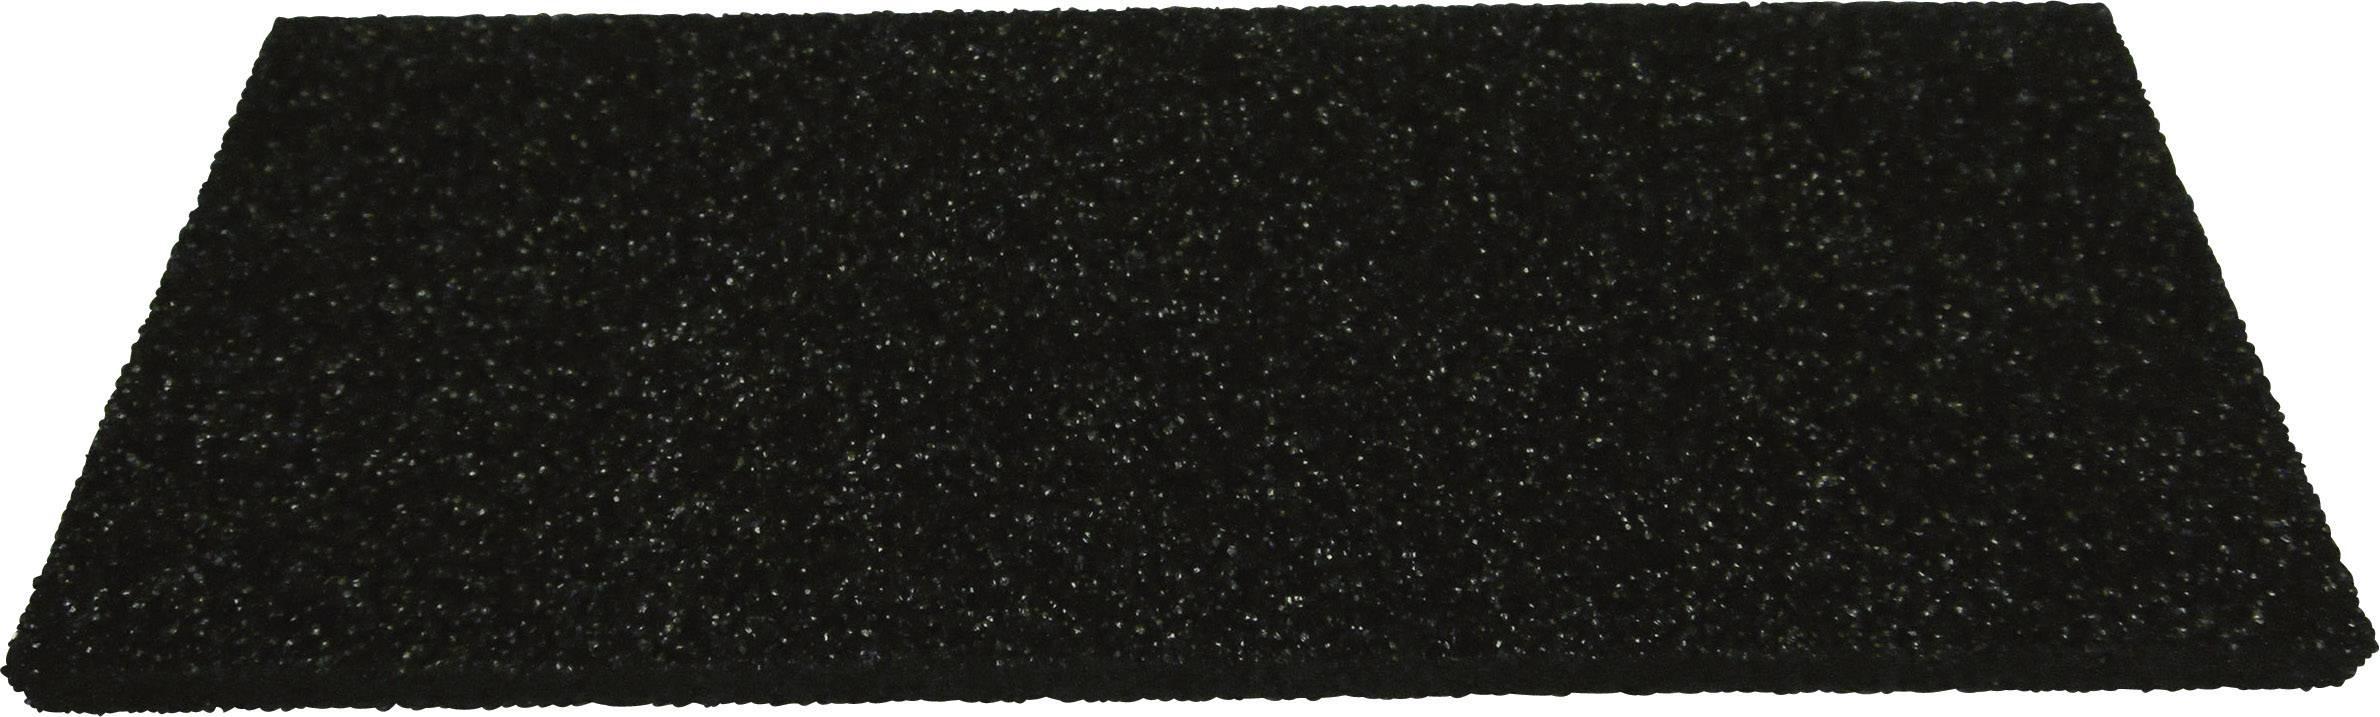 394612, (d x š x v) 138 x 55 x 5 mm, čierna